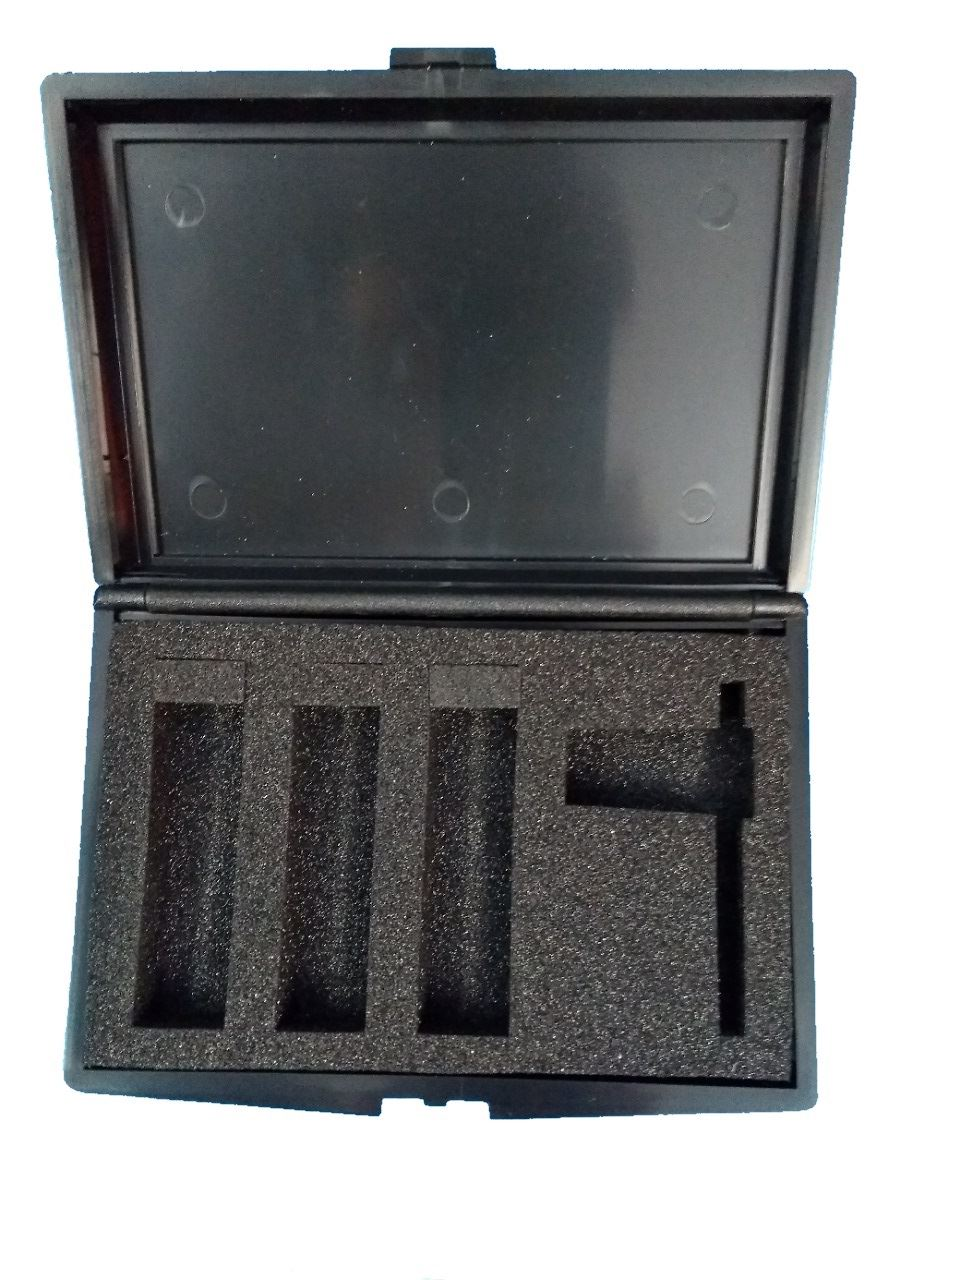 Details about Teague Choke Box 12g Chokes upto 77mm